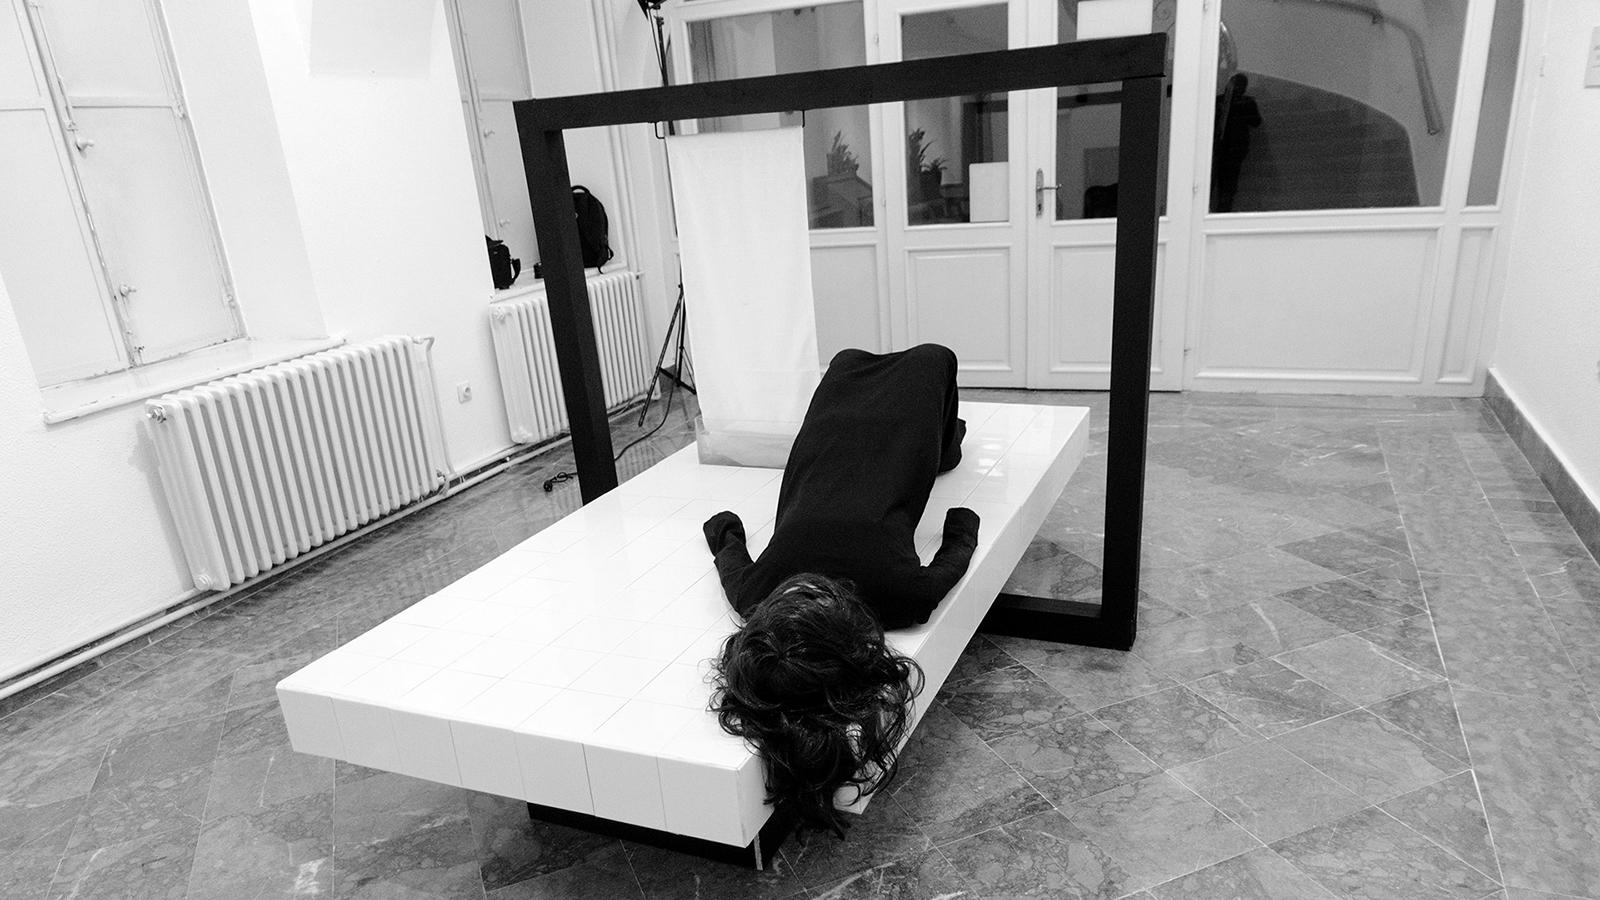 goran despotovski, irony, dead water (mrtva voda), 2016